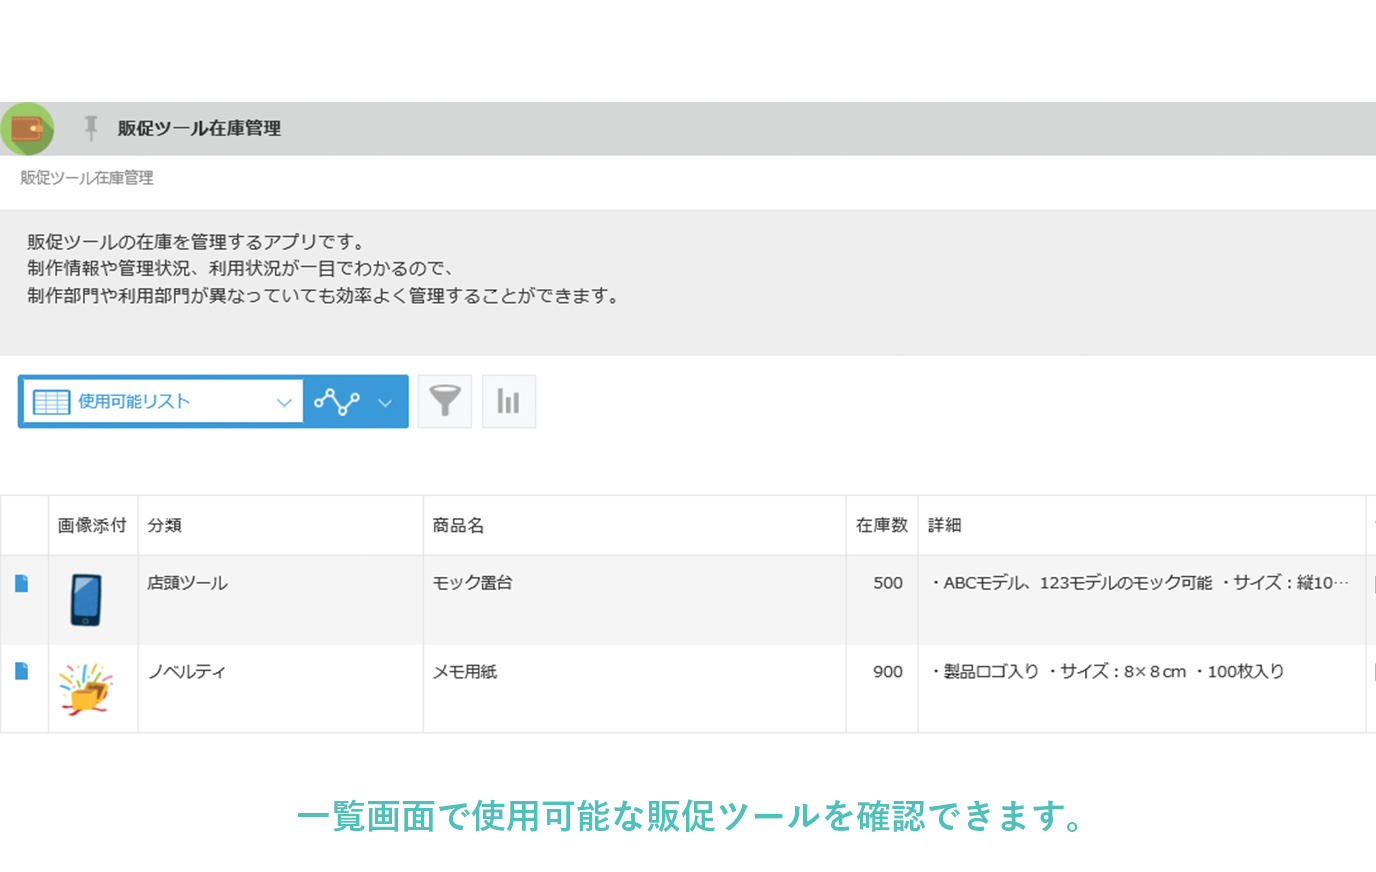 hansoku_01.jpg